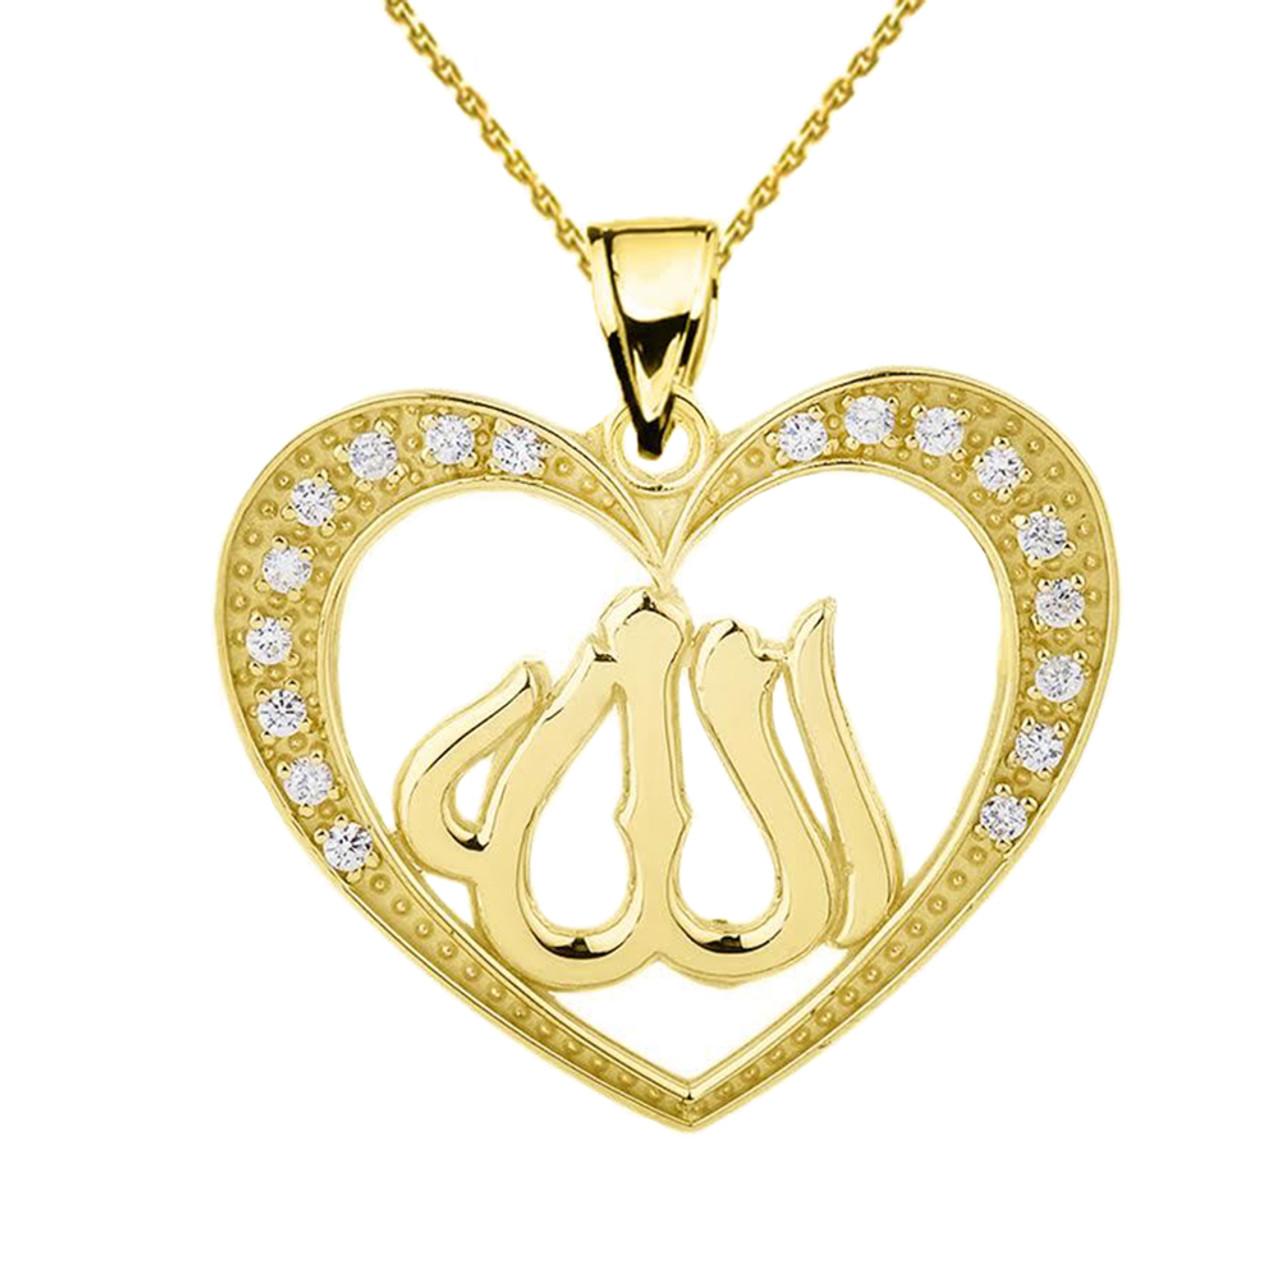 Yellow gold diamond heart with allah pendant necklace aloadofball Gallery